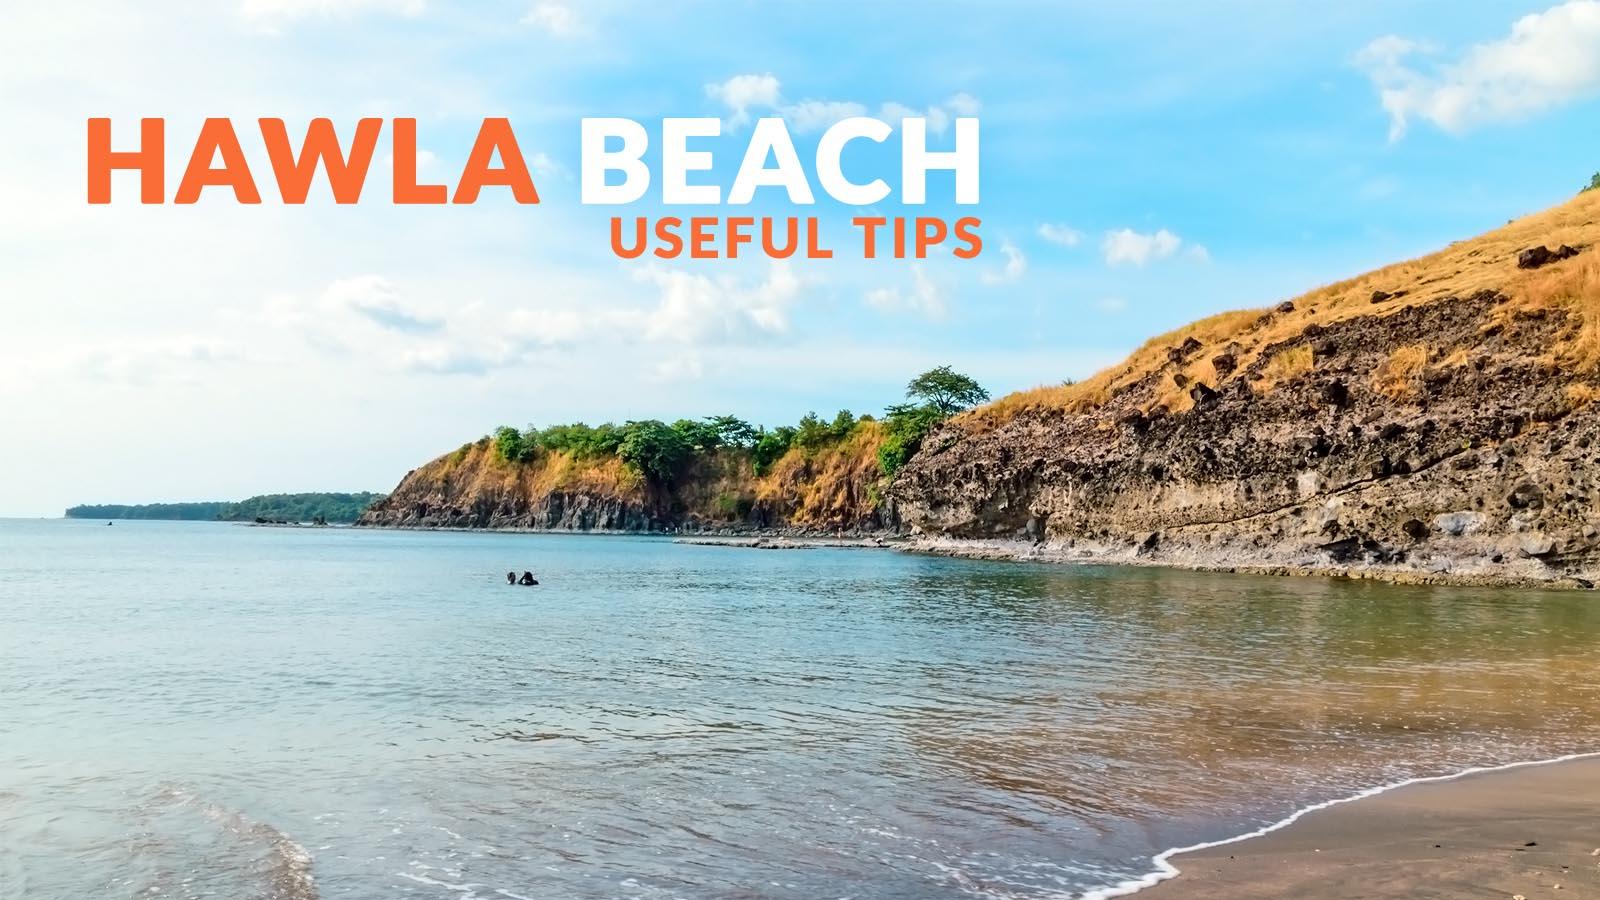 Hawla Beach Panoypoy Beach Bataan Important Tips Philippine Beach Guide